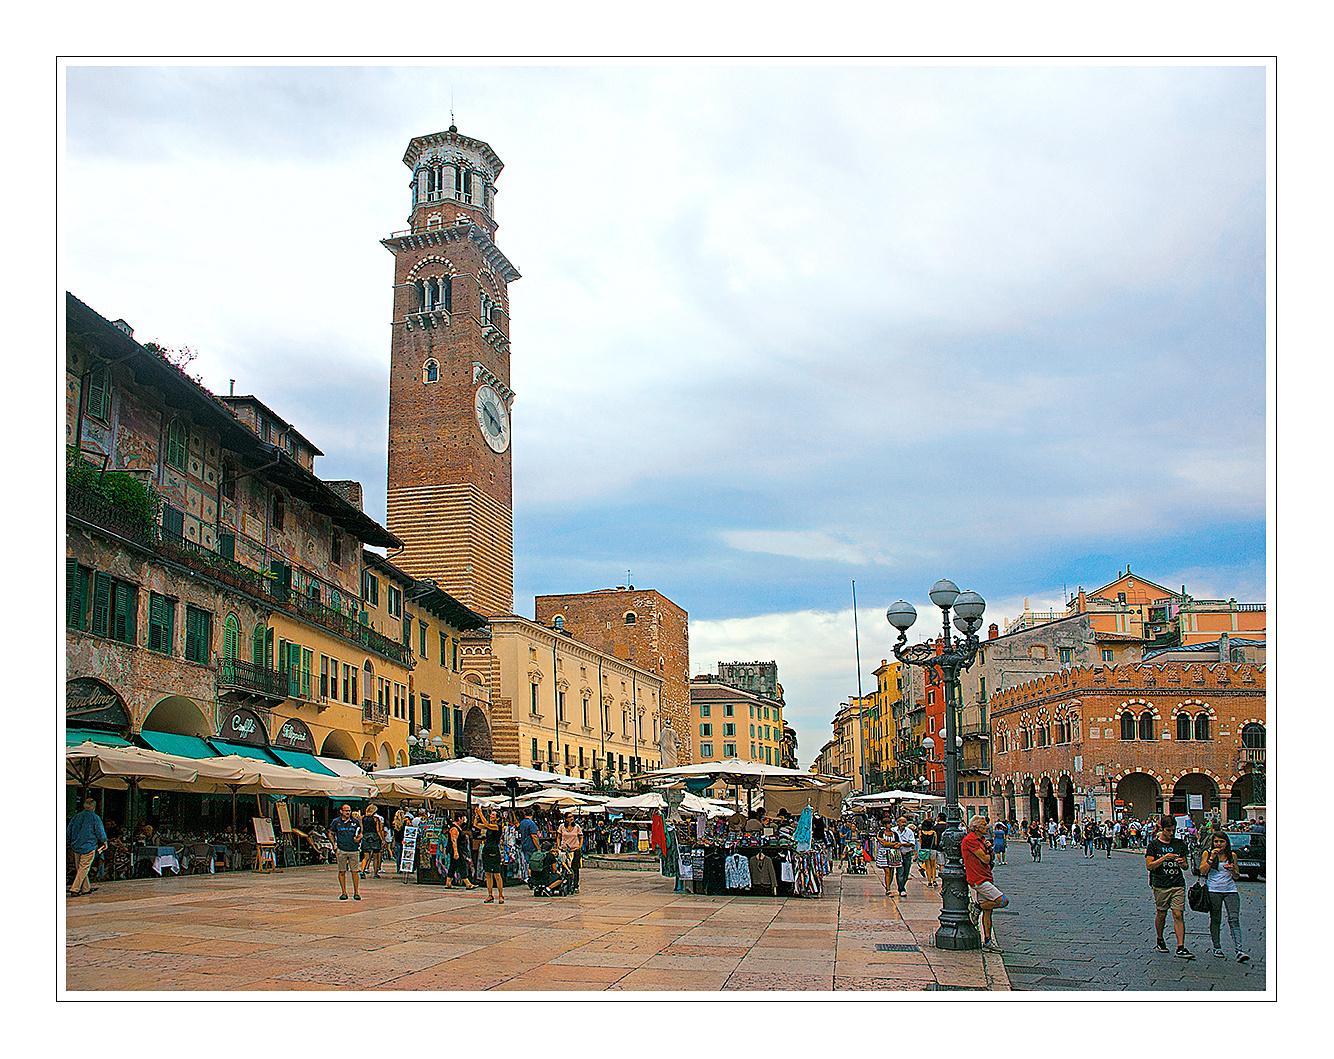 Piazza Erbe in Verona